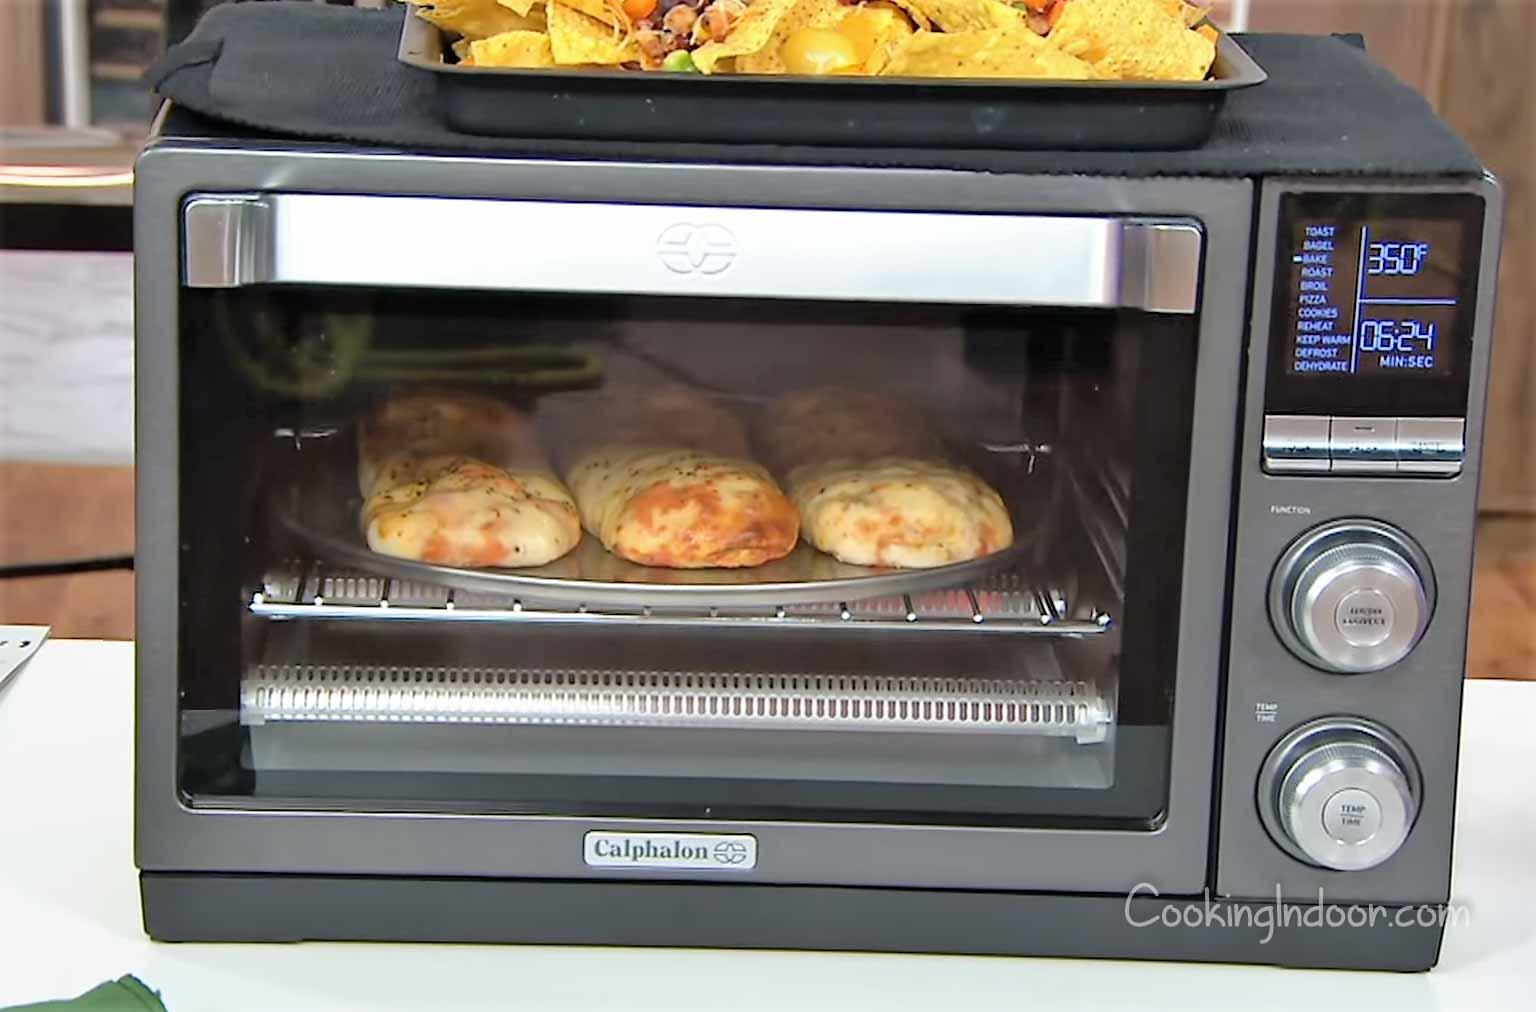 Best calphalon toaster oven